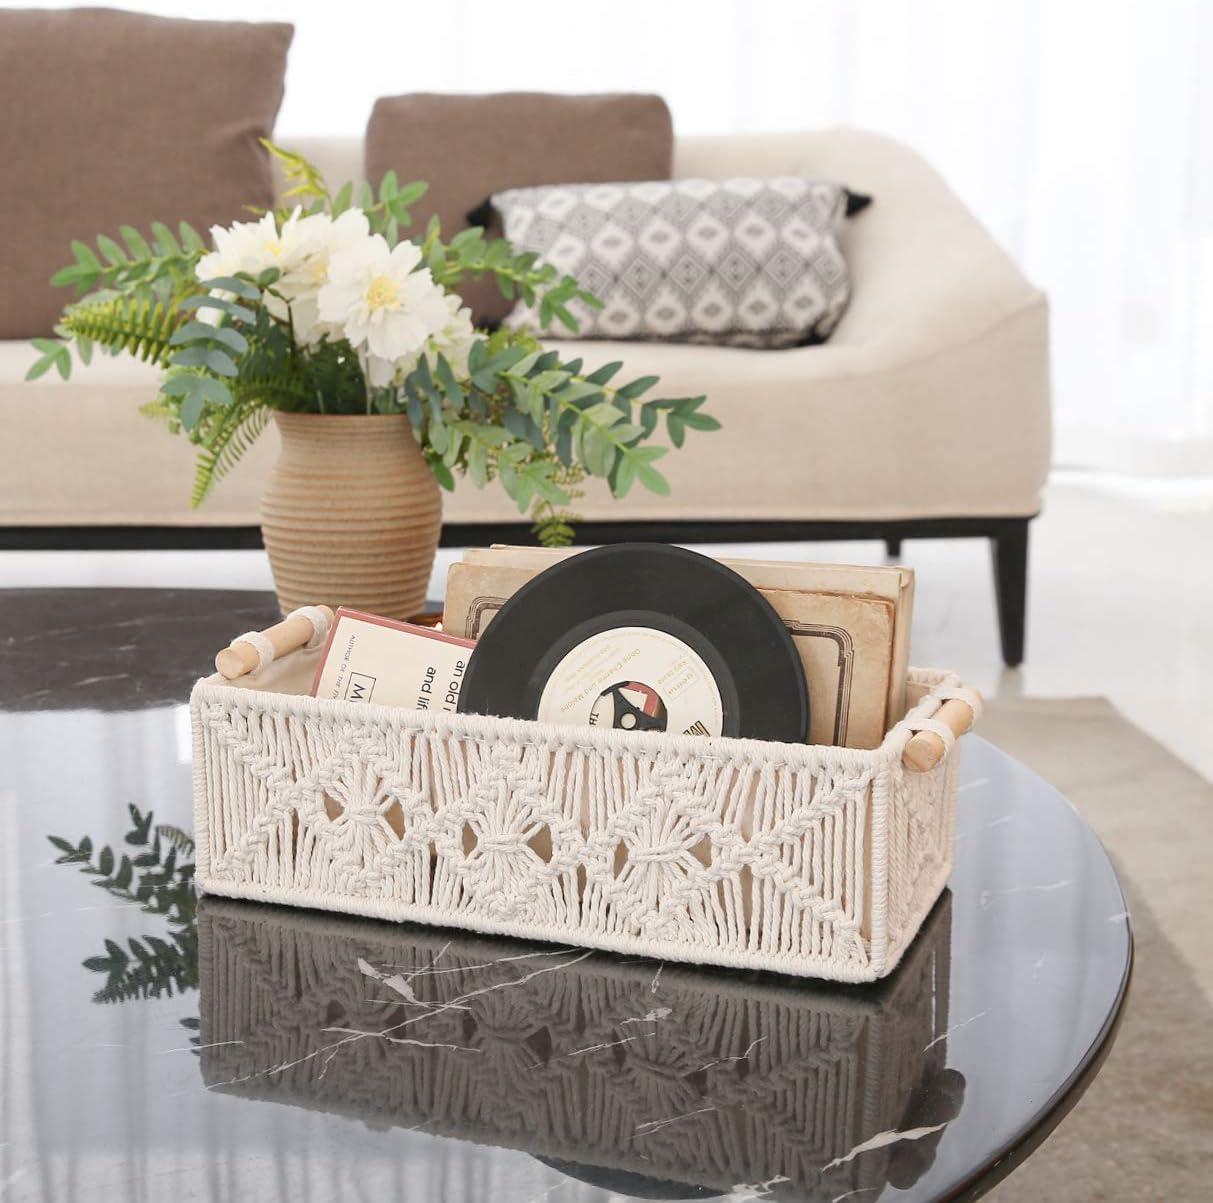 Mkono Macrame Storage Baskets Decor Box Handmade Woven Decorative Countertop Toilet Tank Shelf Cabinet Organizer Boho Decor for Bedroom Nursery Livingroom Set of 2 Brown